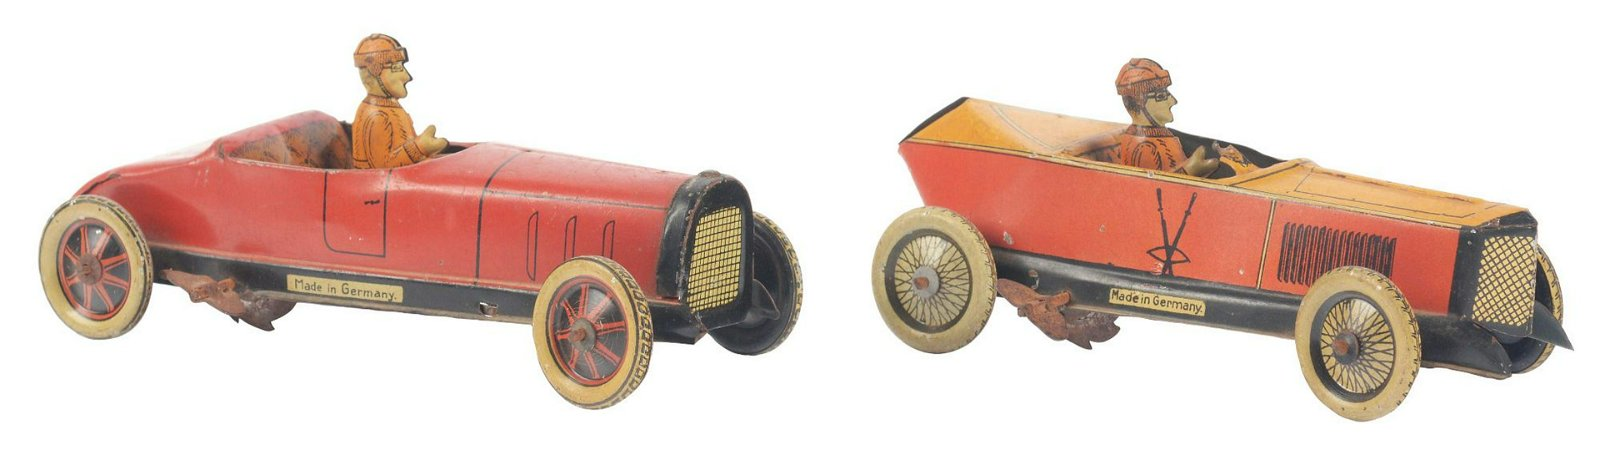 Lot of 2: German Tin-Litho G&K Race Car Toys.